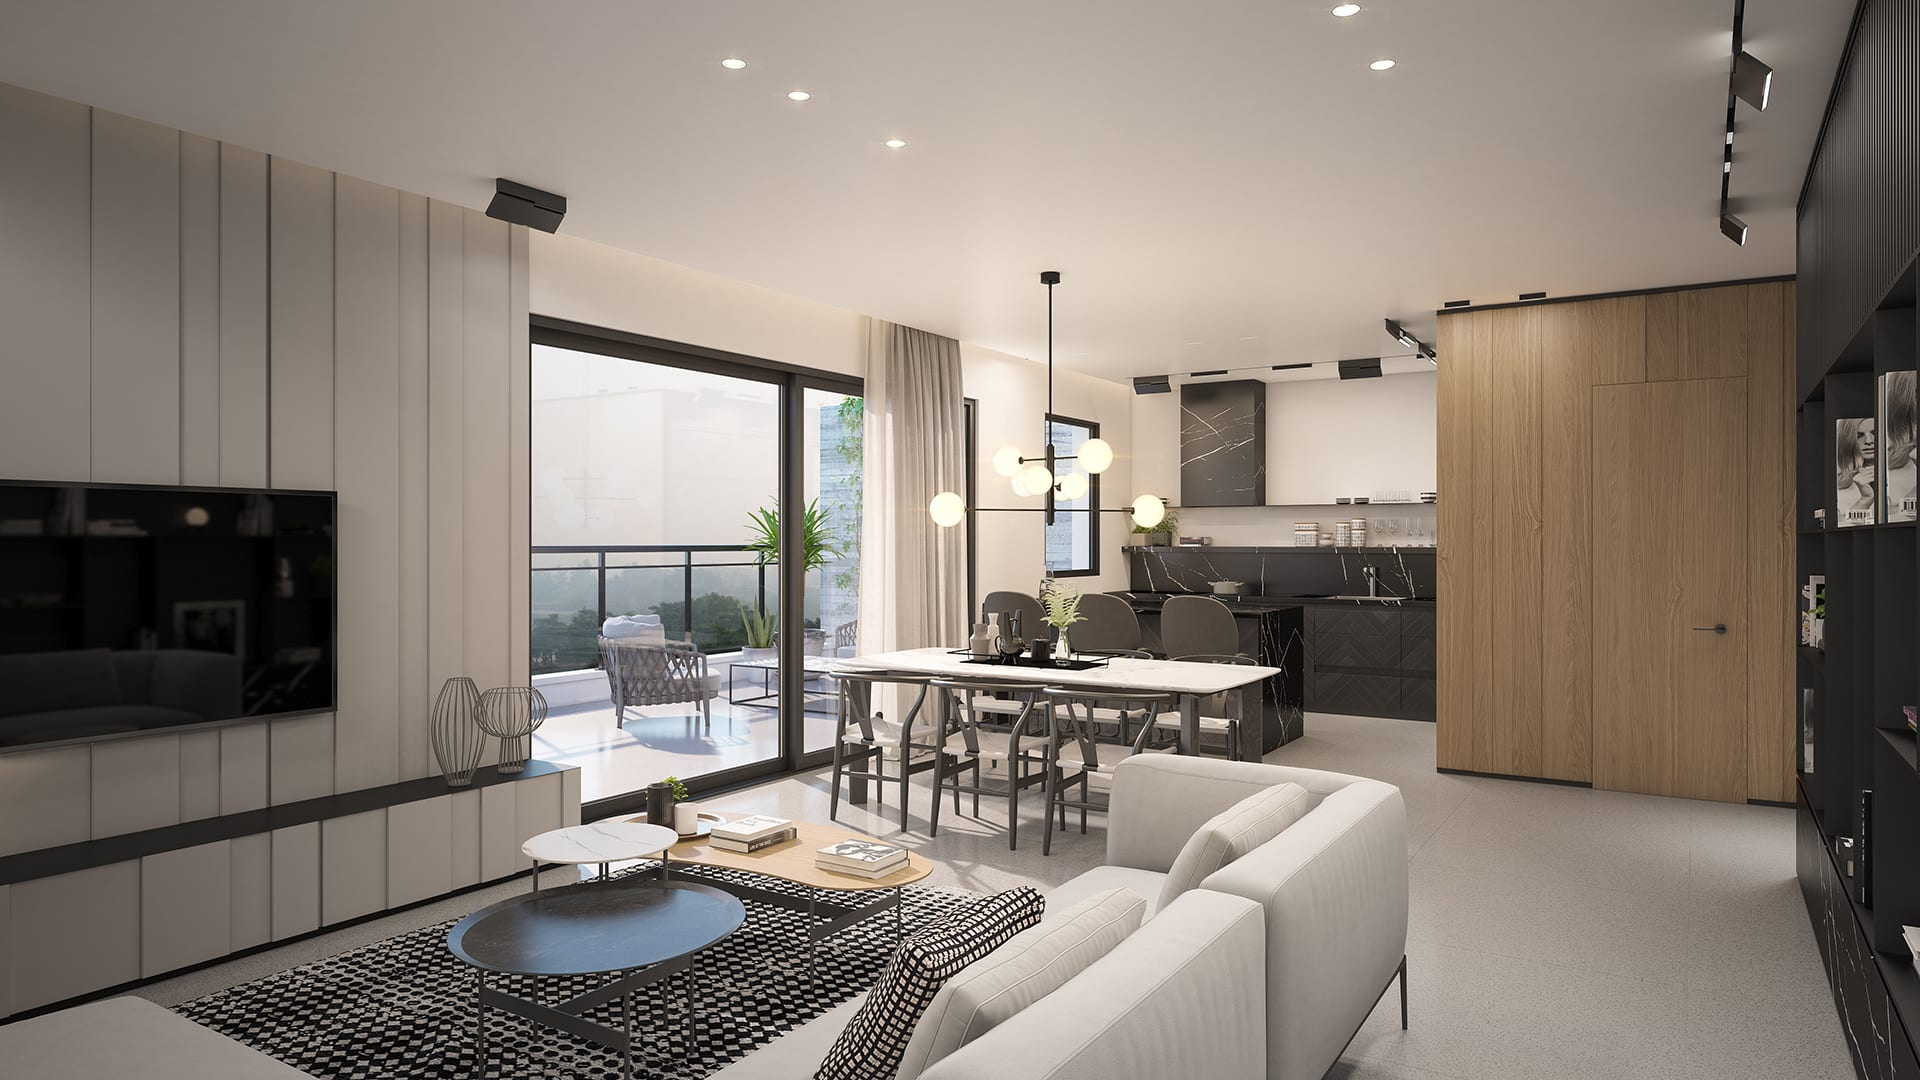 Maayan-Golan_Architectural-Visualization_apartment_kitchen-living-room-visualization_interior-design-sharon-maayan_01